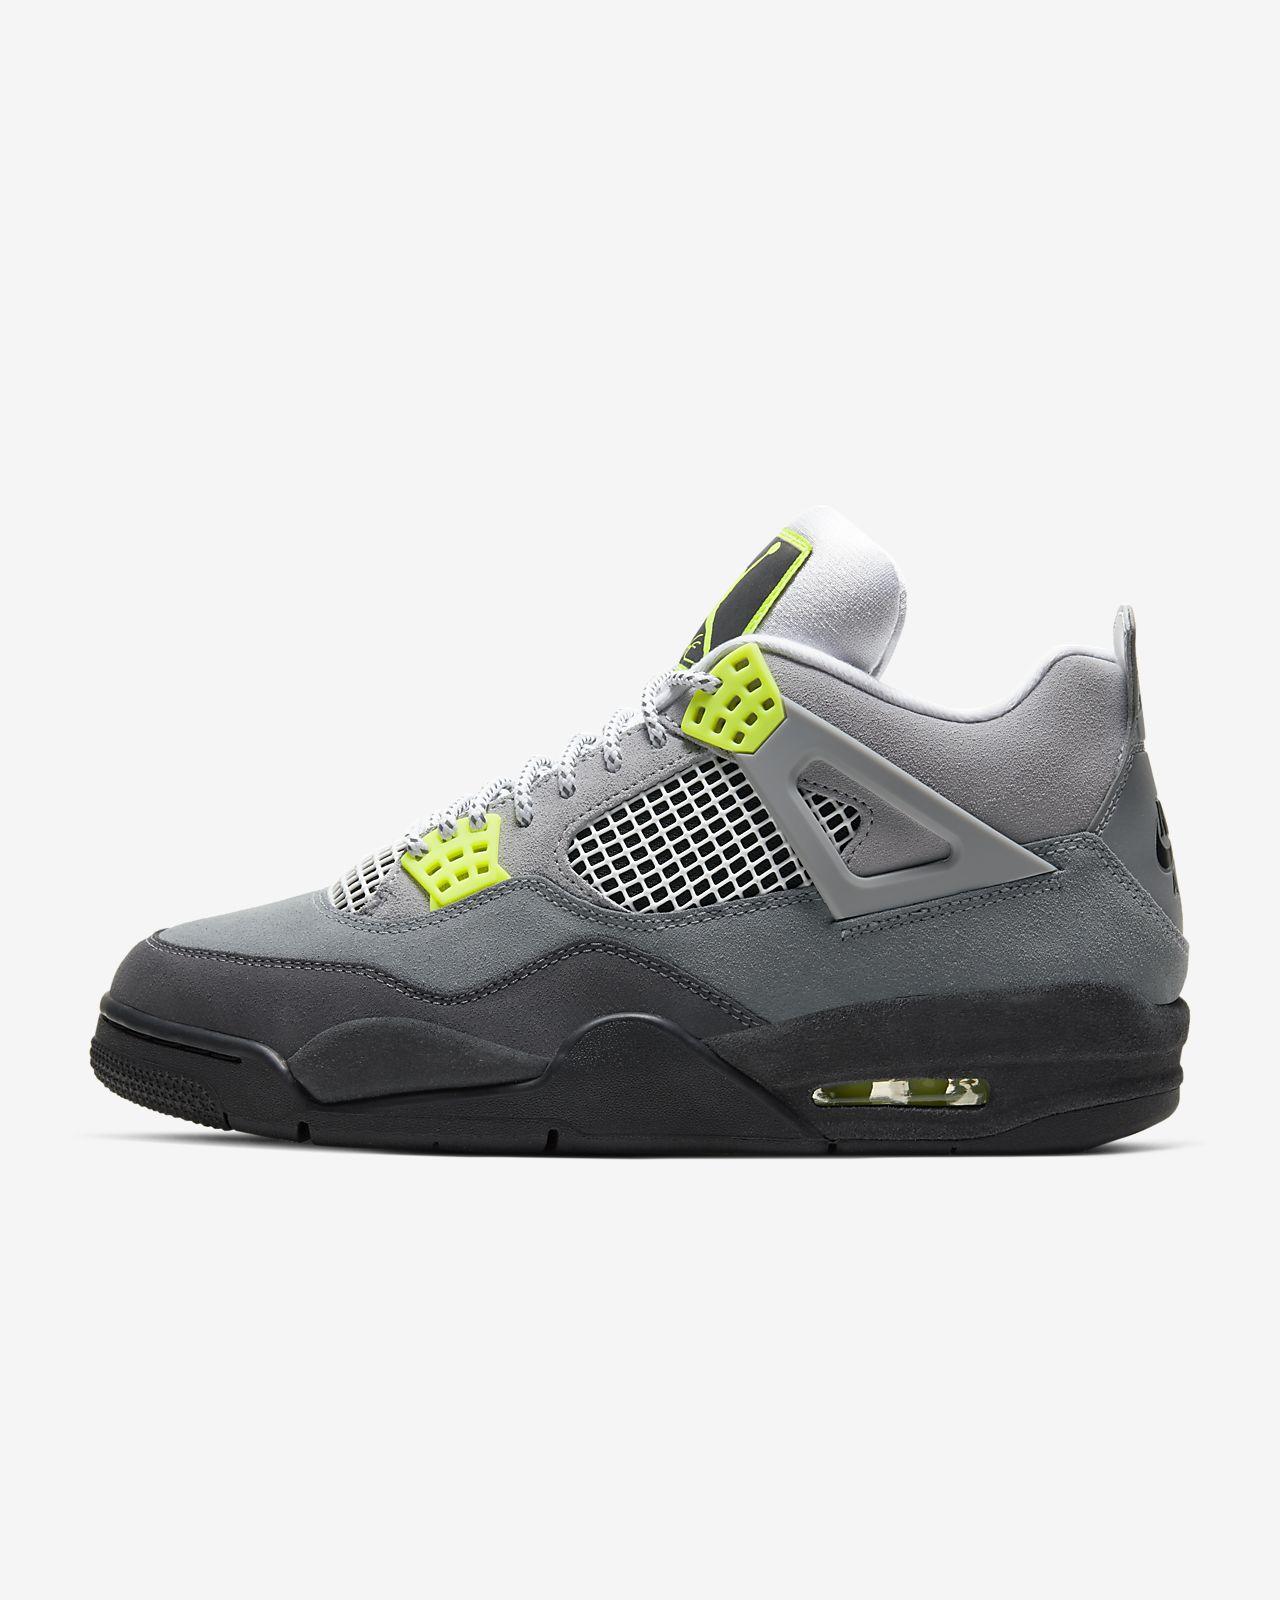 Koop Jordan schoenen. Nike NL